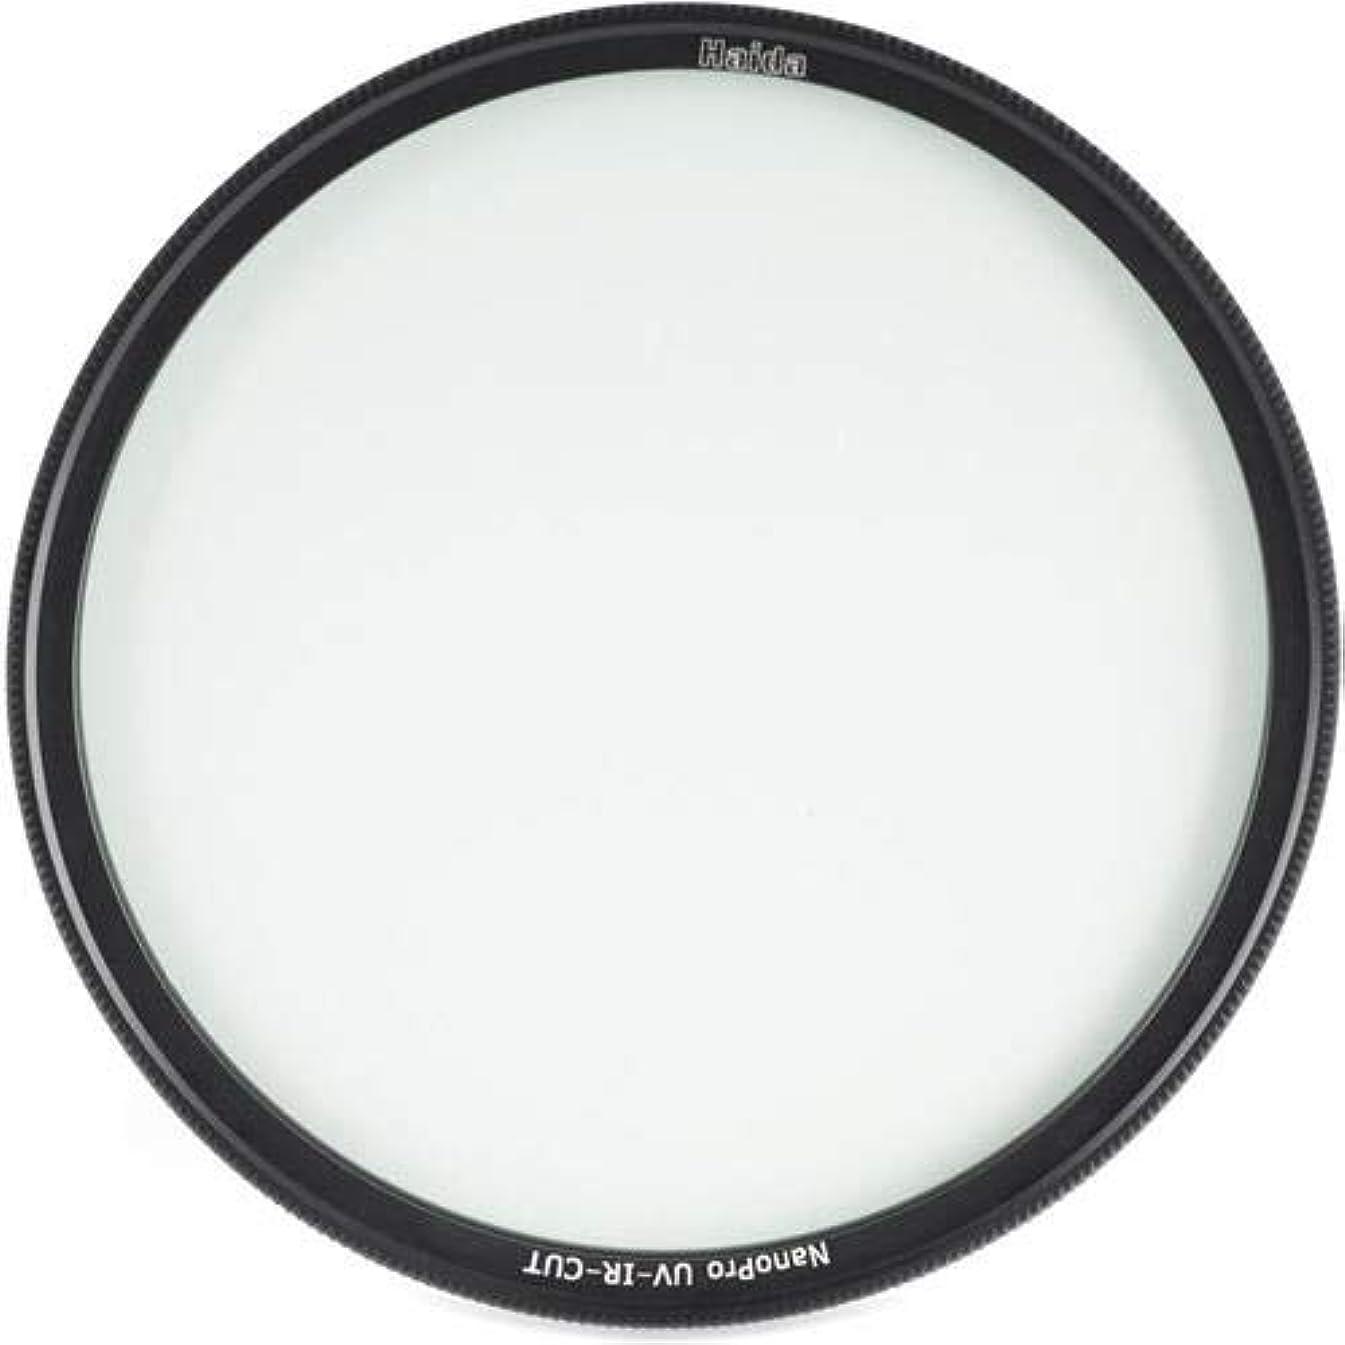 Haida NanoPro 58mm MC UV IR Cut Filter Optical Glass HD4222-58